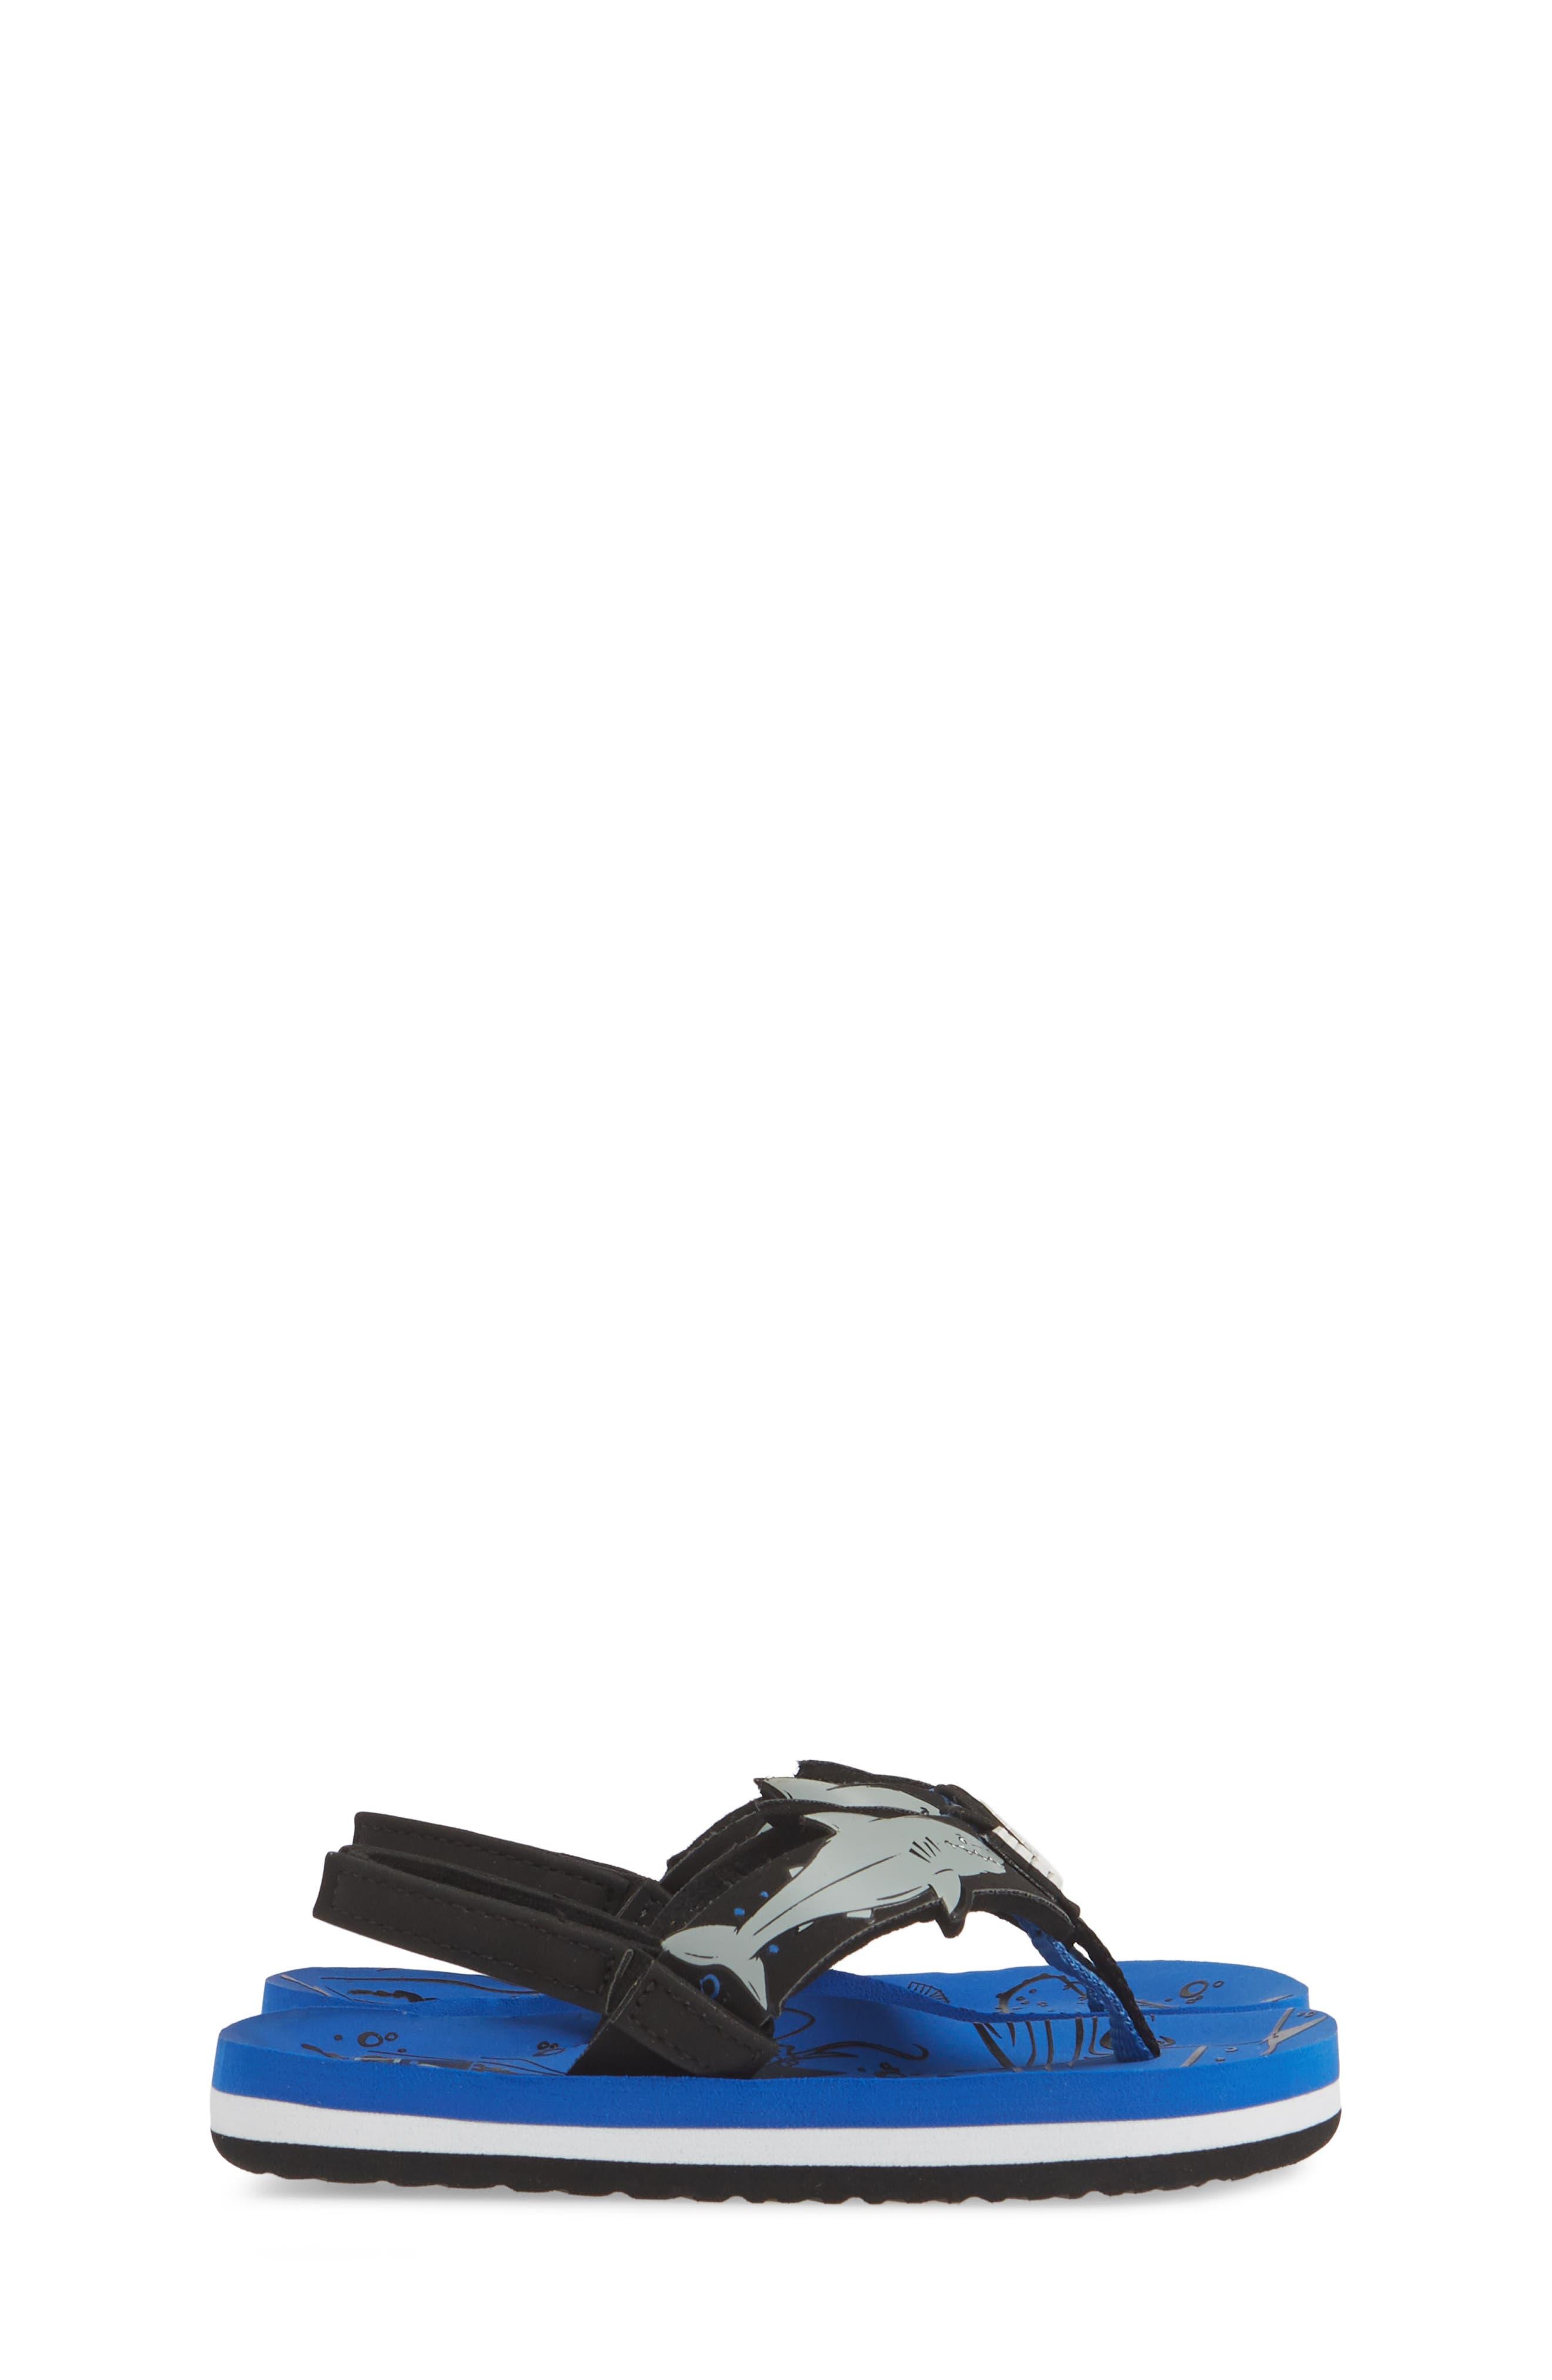 REEF, Ahi Shark Flip Flop, Alternate thumbnail 4, color, BLUE